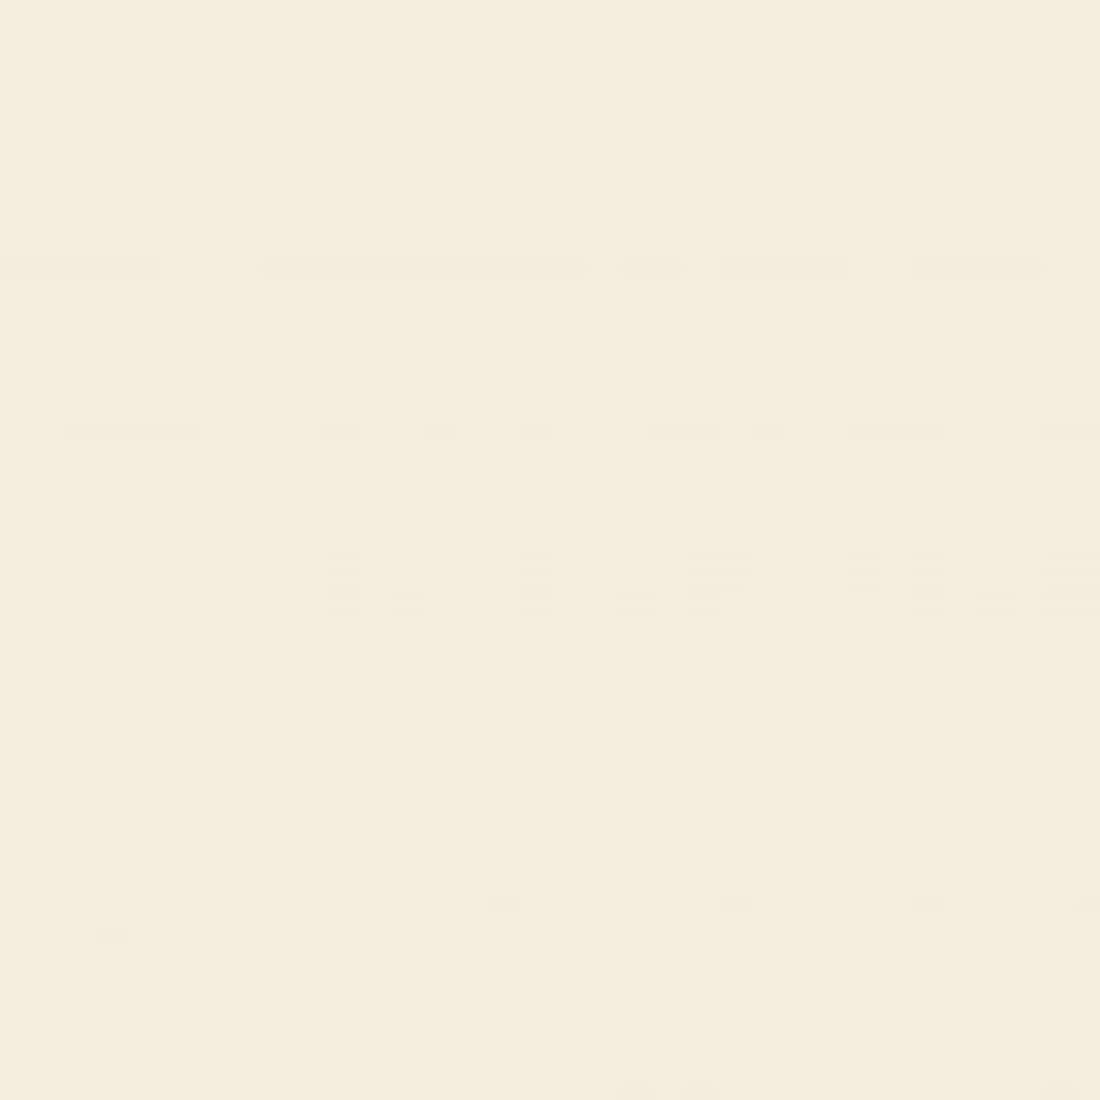 Piso Embramaco 50 x 50 Beige Absolut Ref: 51700